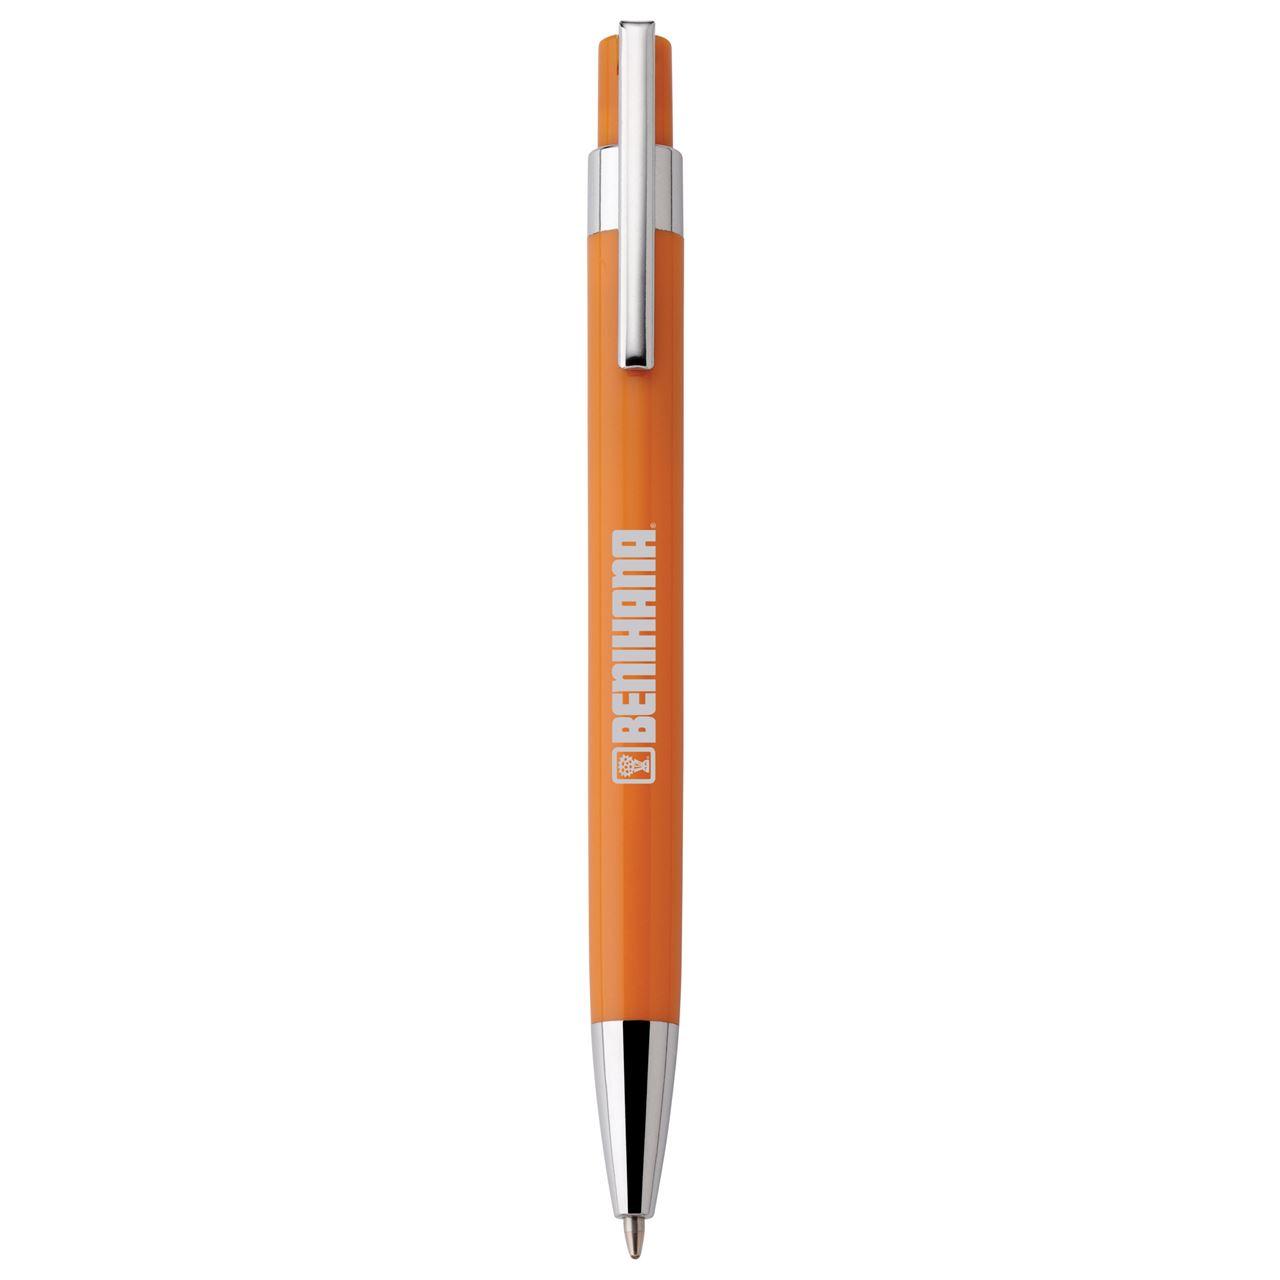 Picture of Entripy Promo Tempest Ballpoint Pen